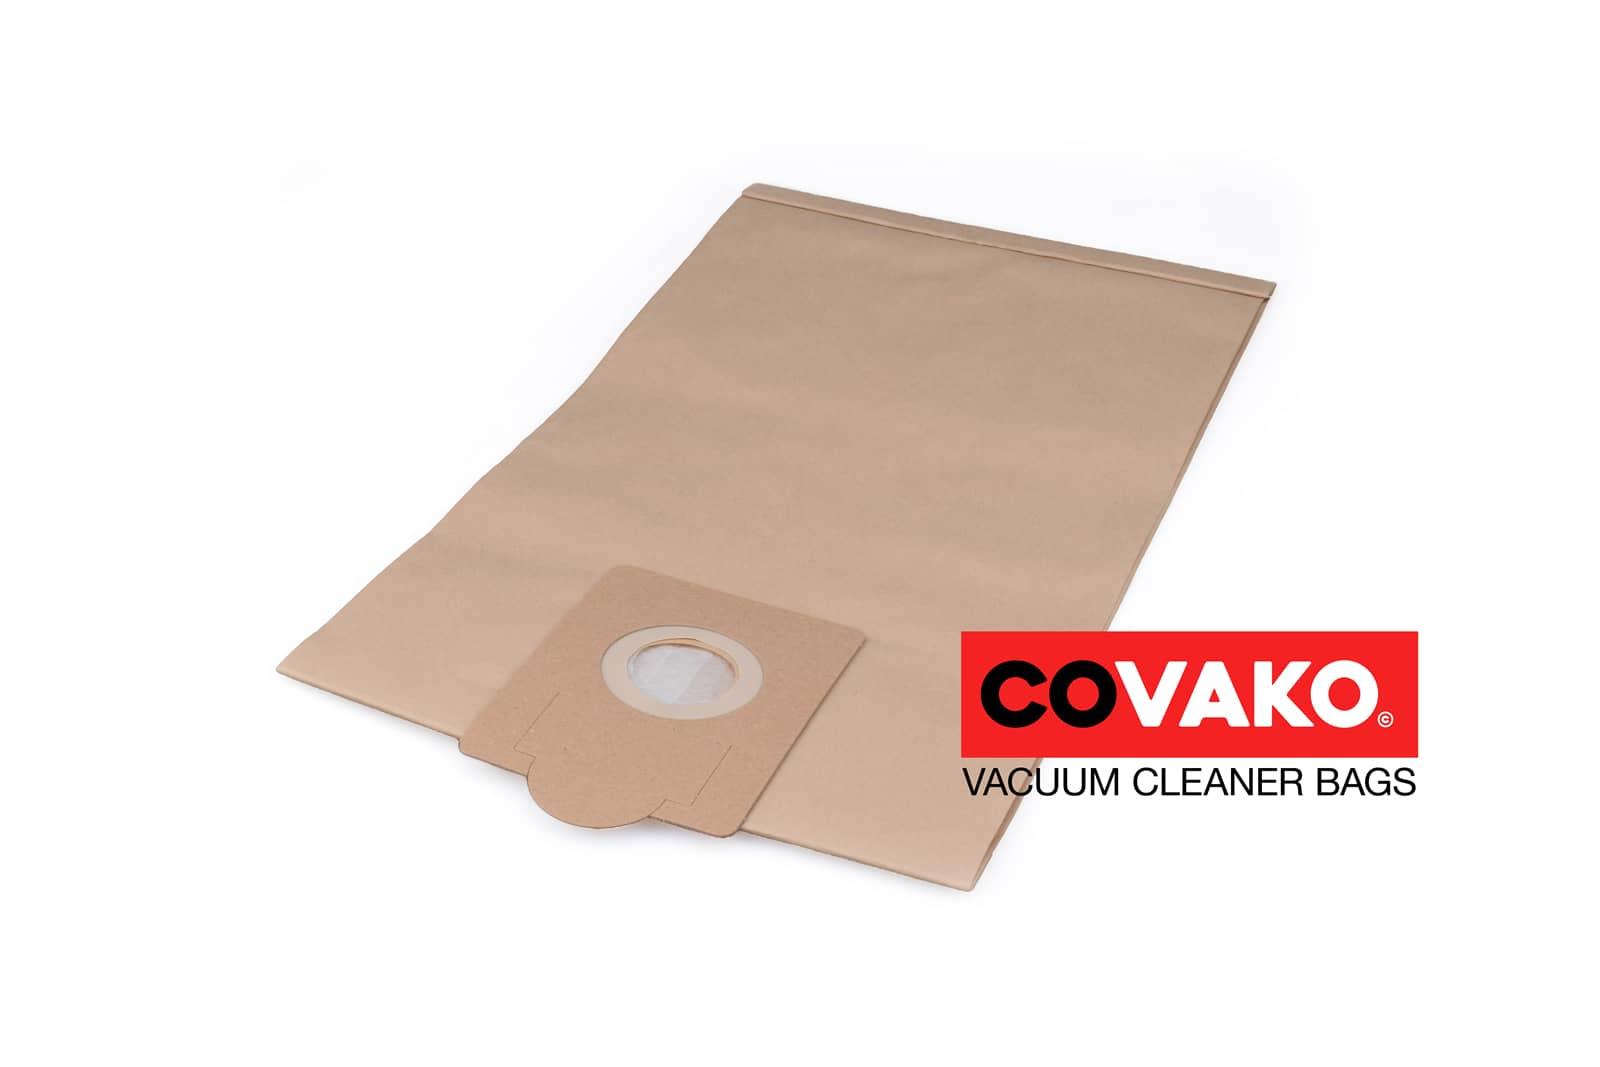 Elsea F 1003 C / Paper - Elsea vacuum cleaner bags